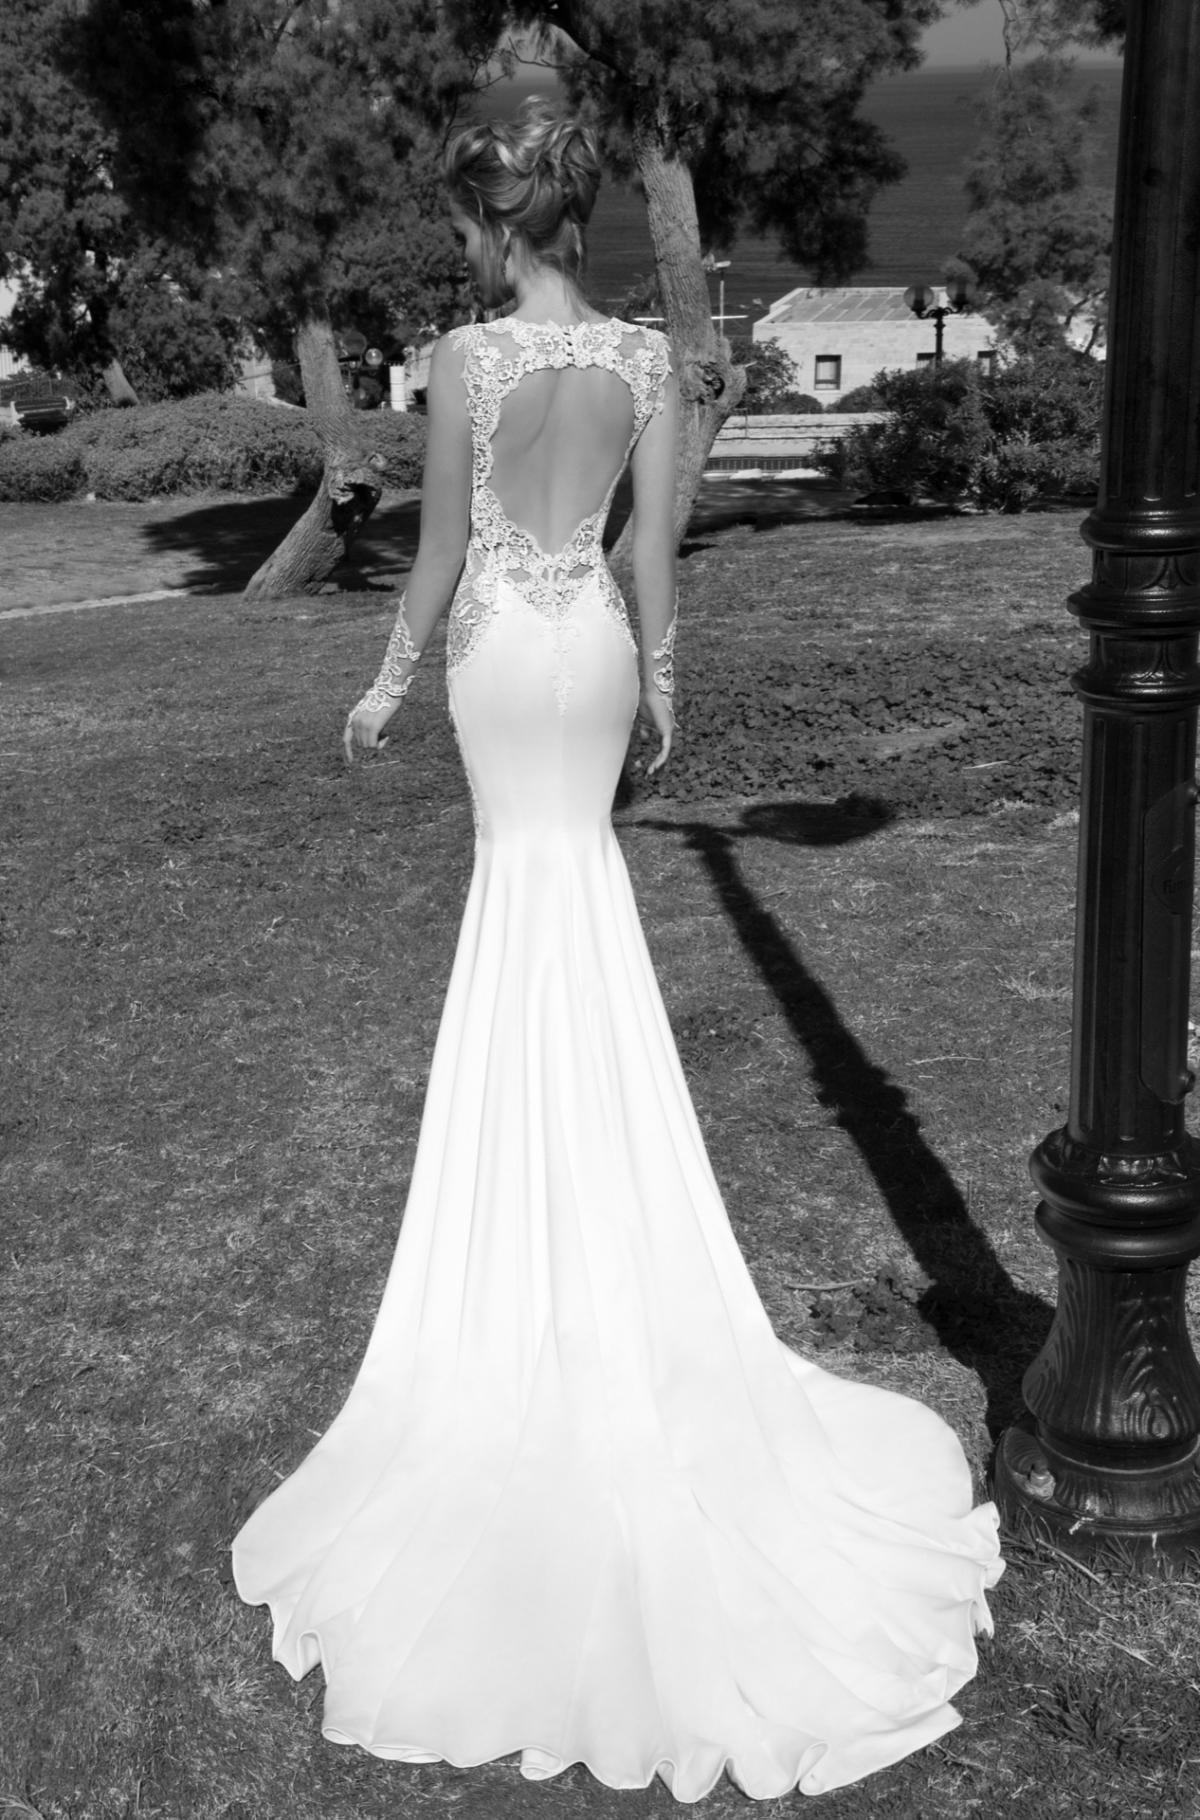 suknia ślubna Galia Lahav z odsłoniętymi plecami